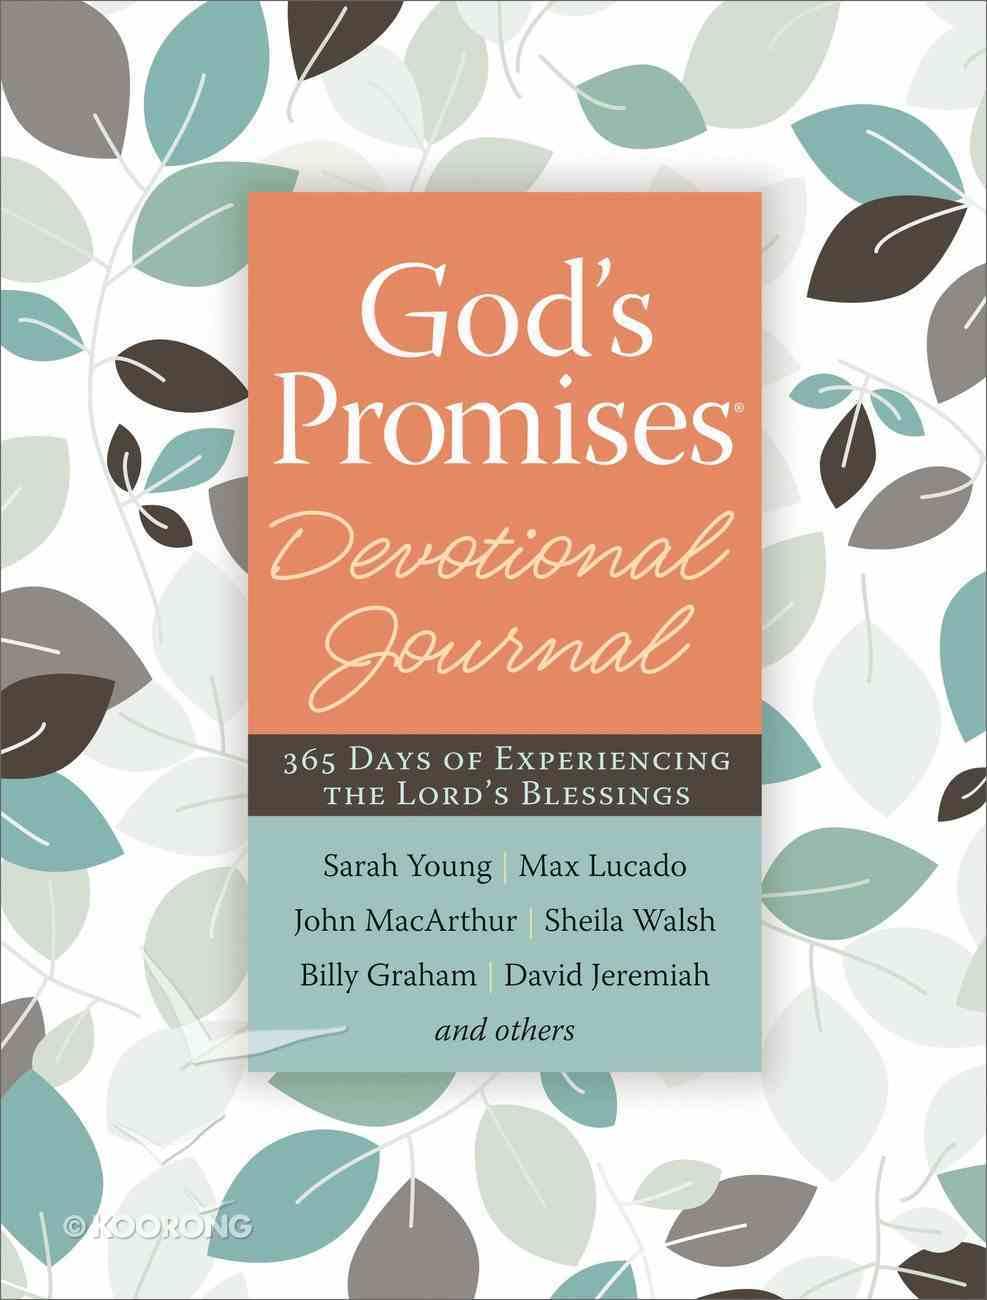 Devotional Journal: God's Promises eBook